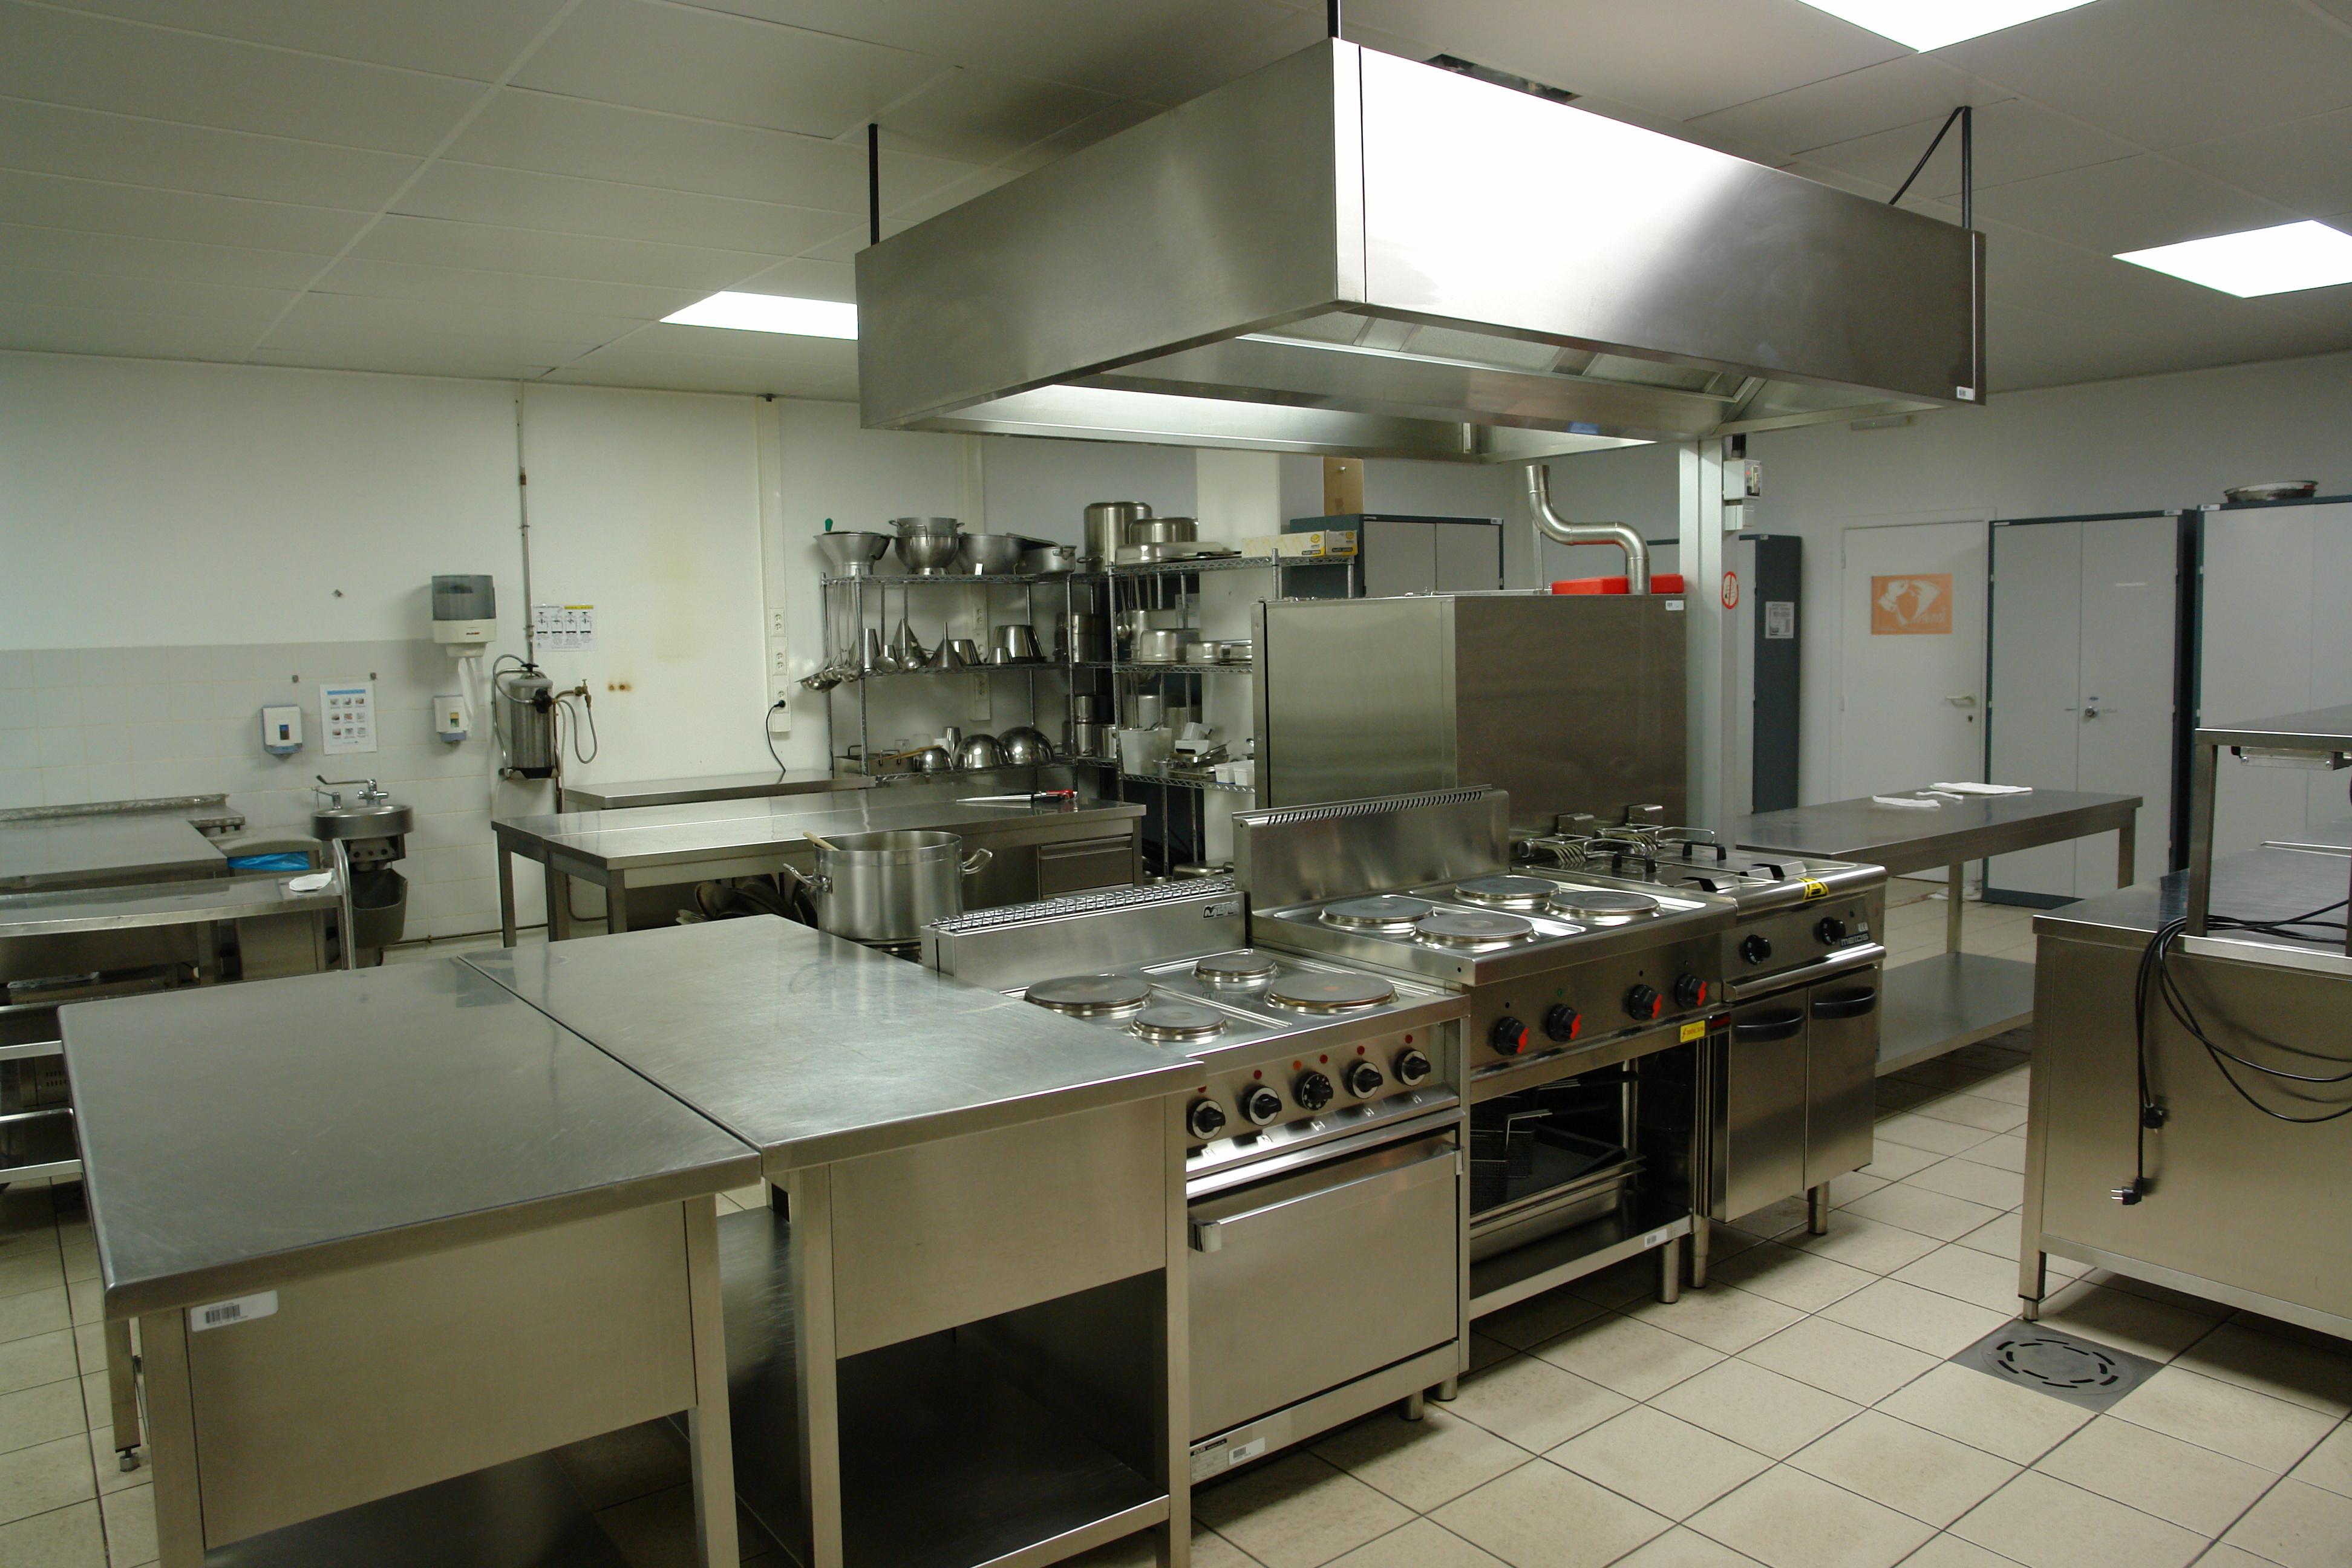 Kitchen Equipment Cleaning | Bakersfield Vent & Hood